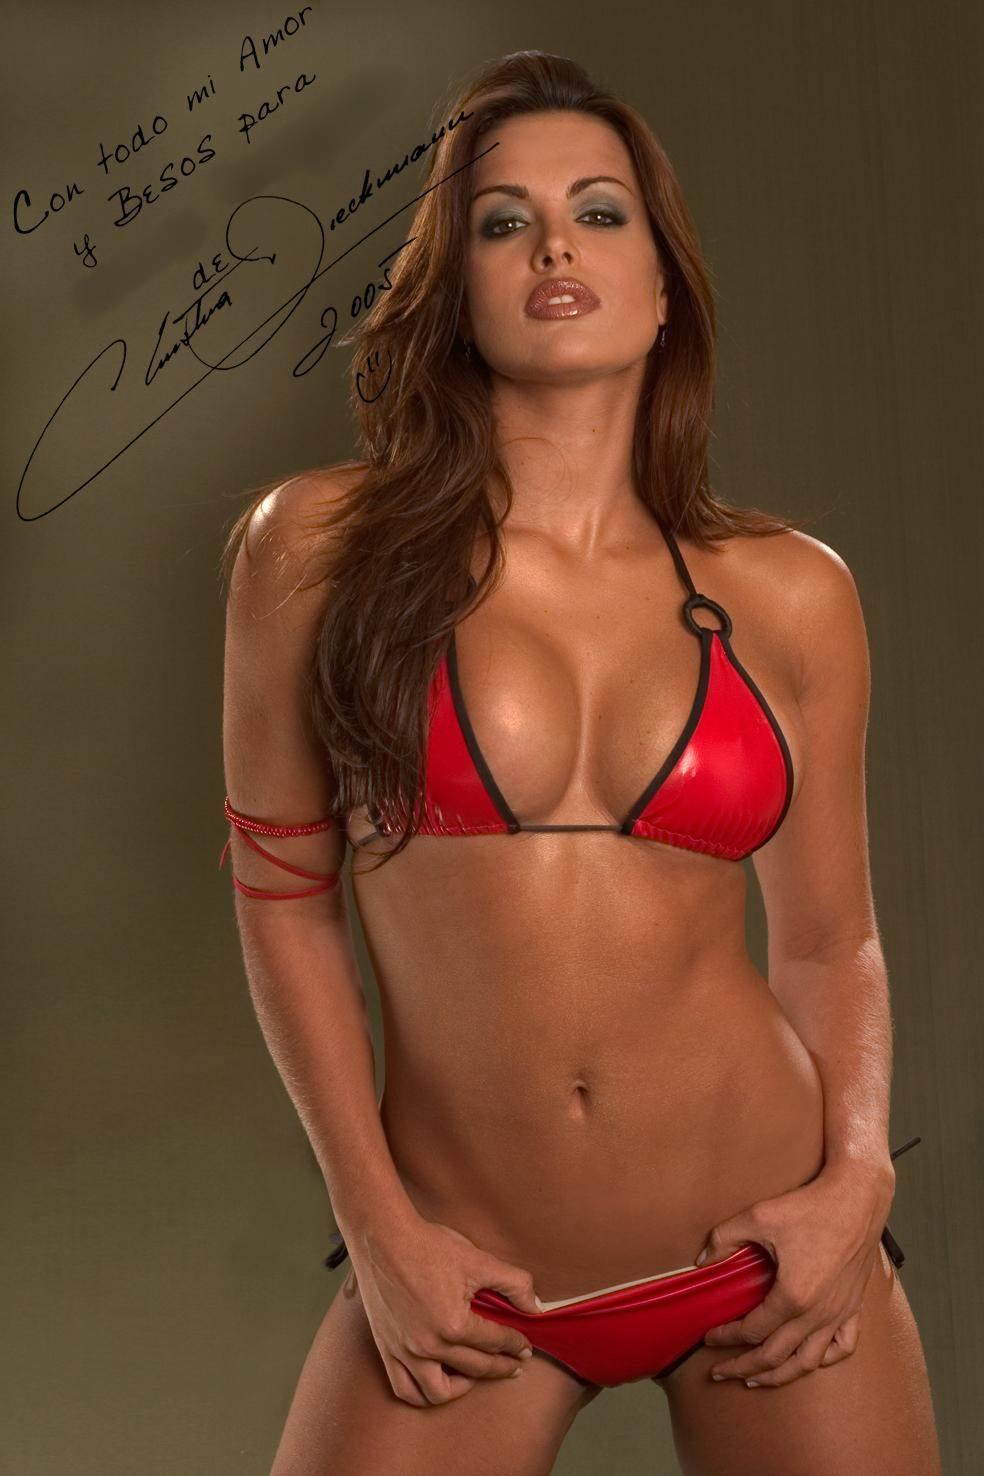 Miss World Venezuela Christina Dieckmann Jim Nez Nueva